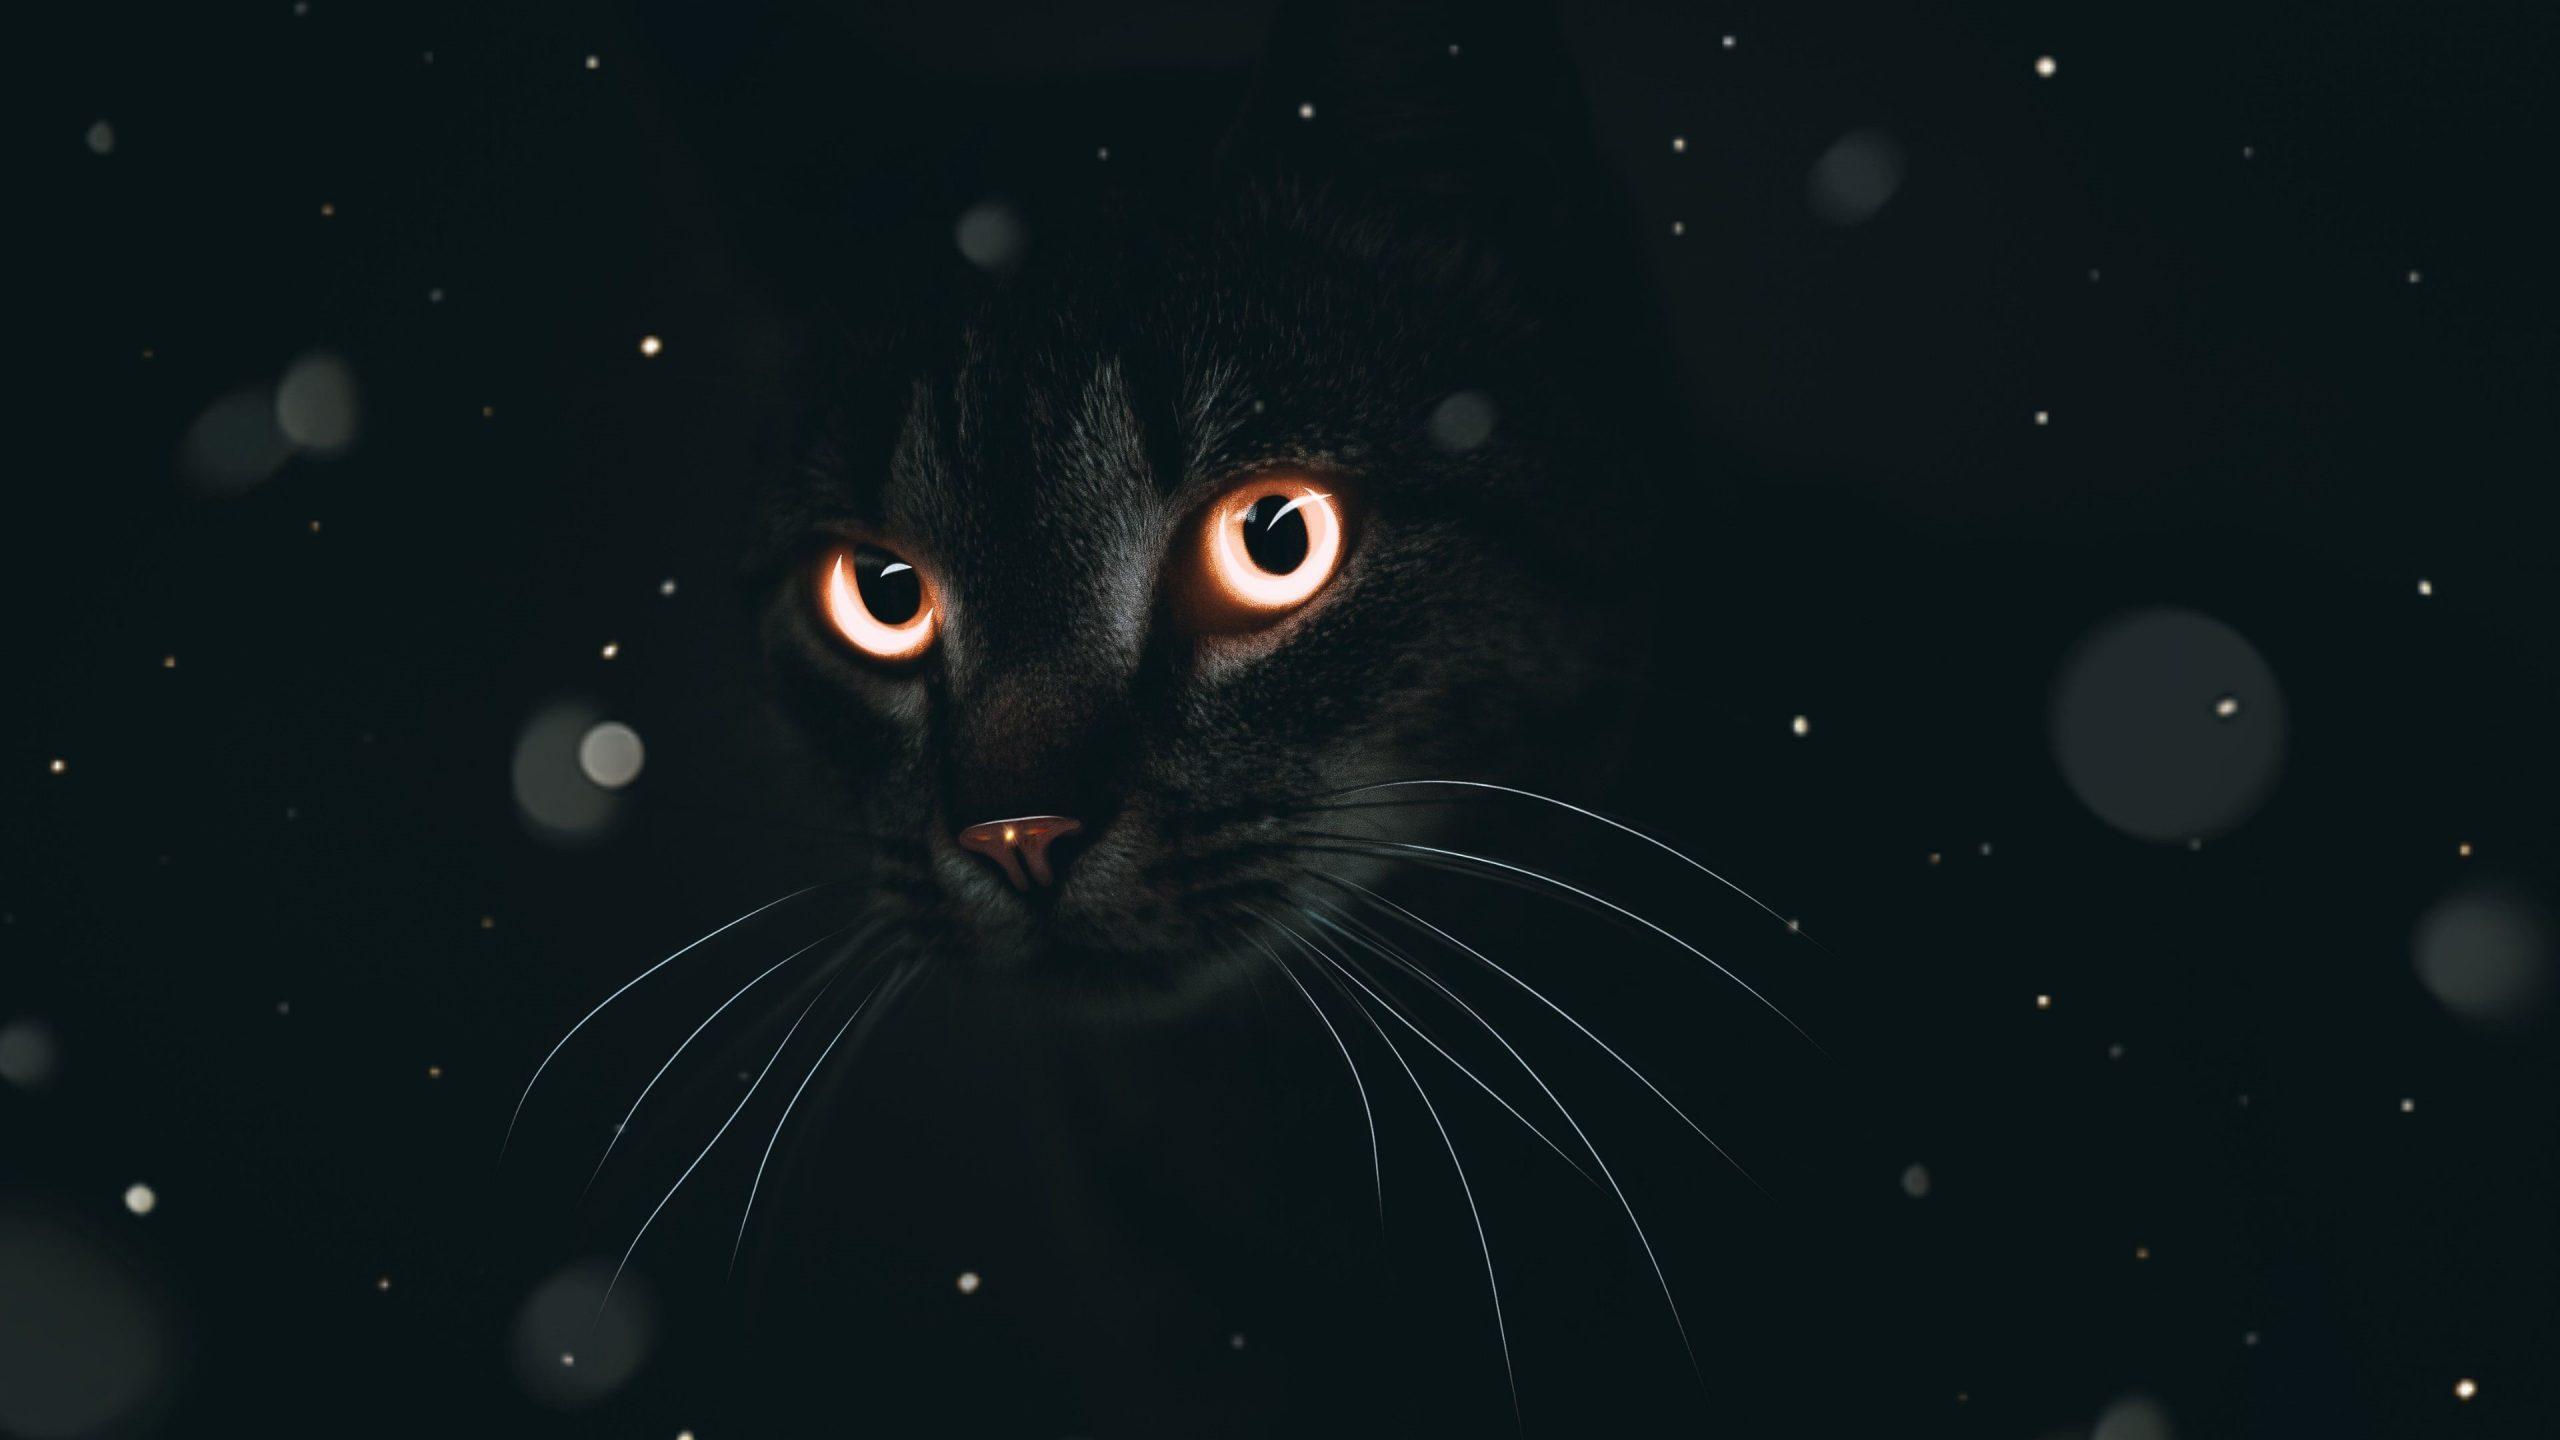 Dark Cat Hd Wallpaper Desktop